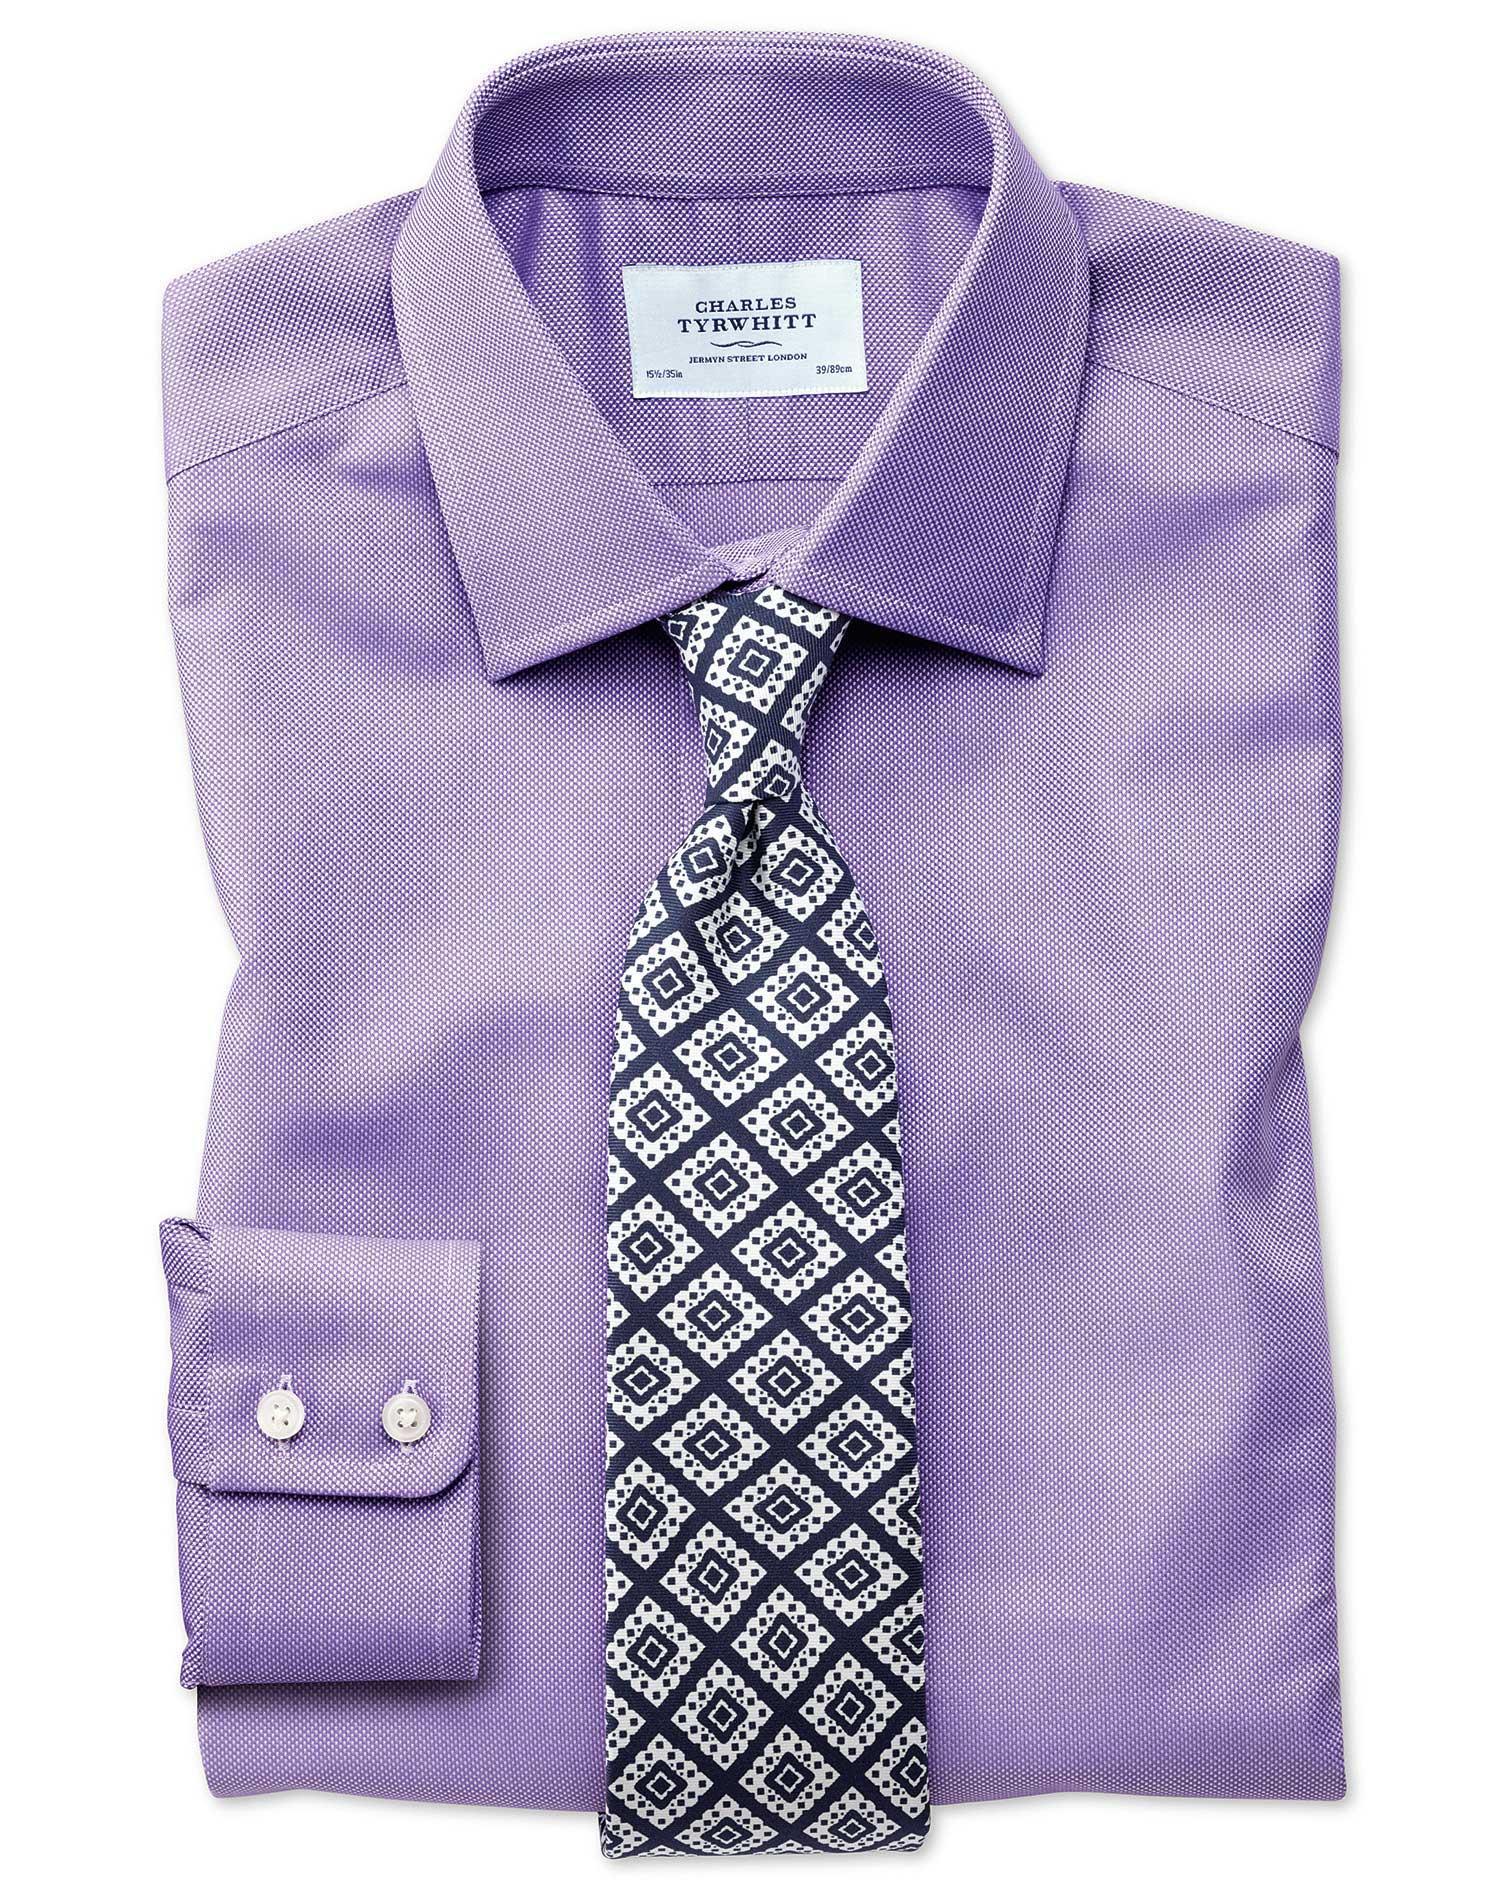 Extra slim fit egyptian cotton royal oxford lilac shirt for Extra slim tuxedo shirt